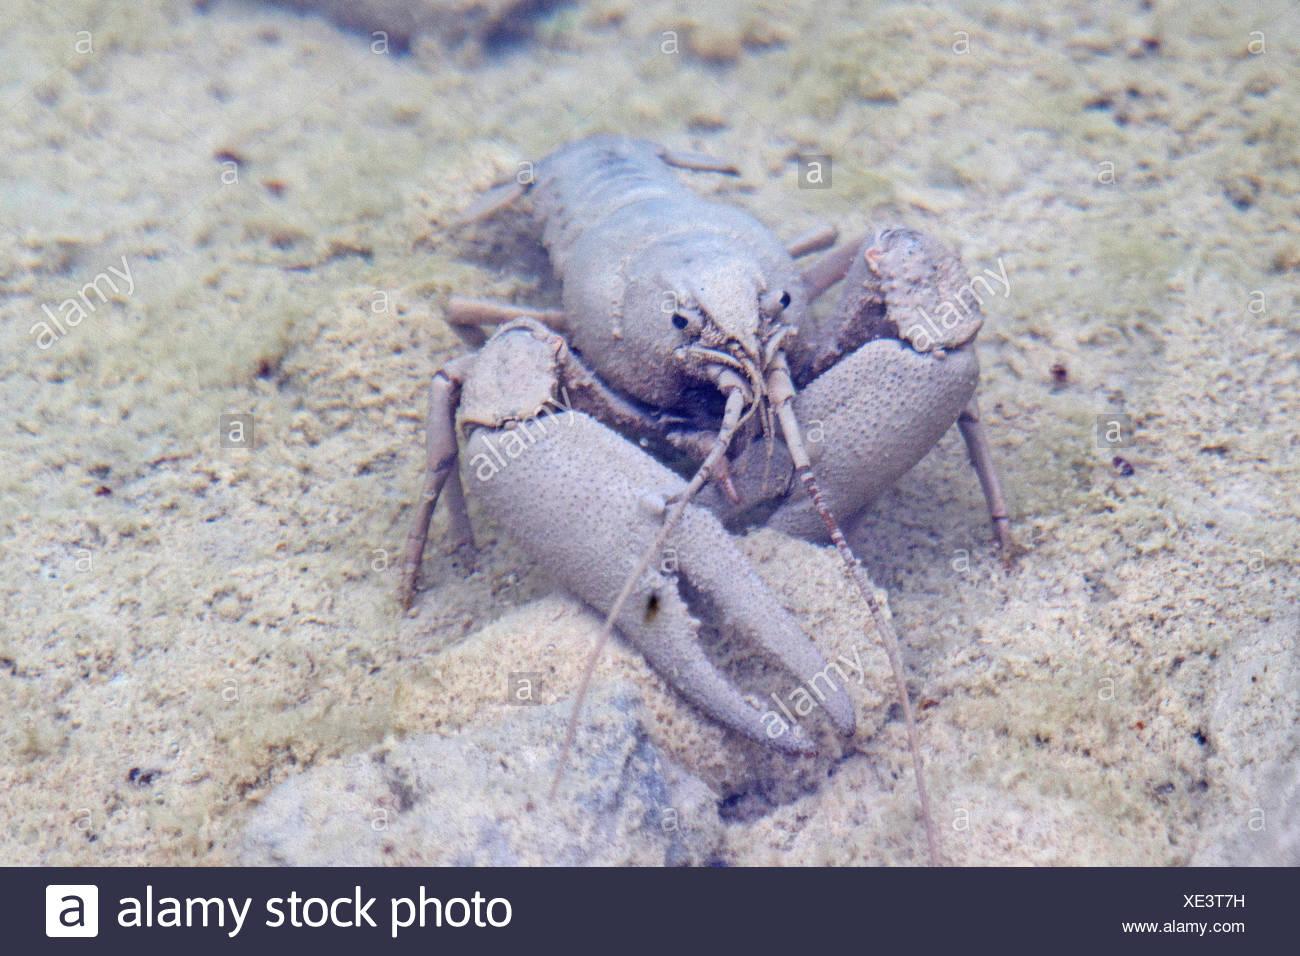 crayfish with camouflage - Stock Image